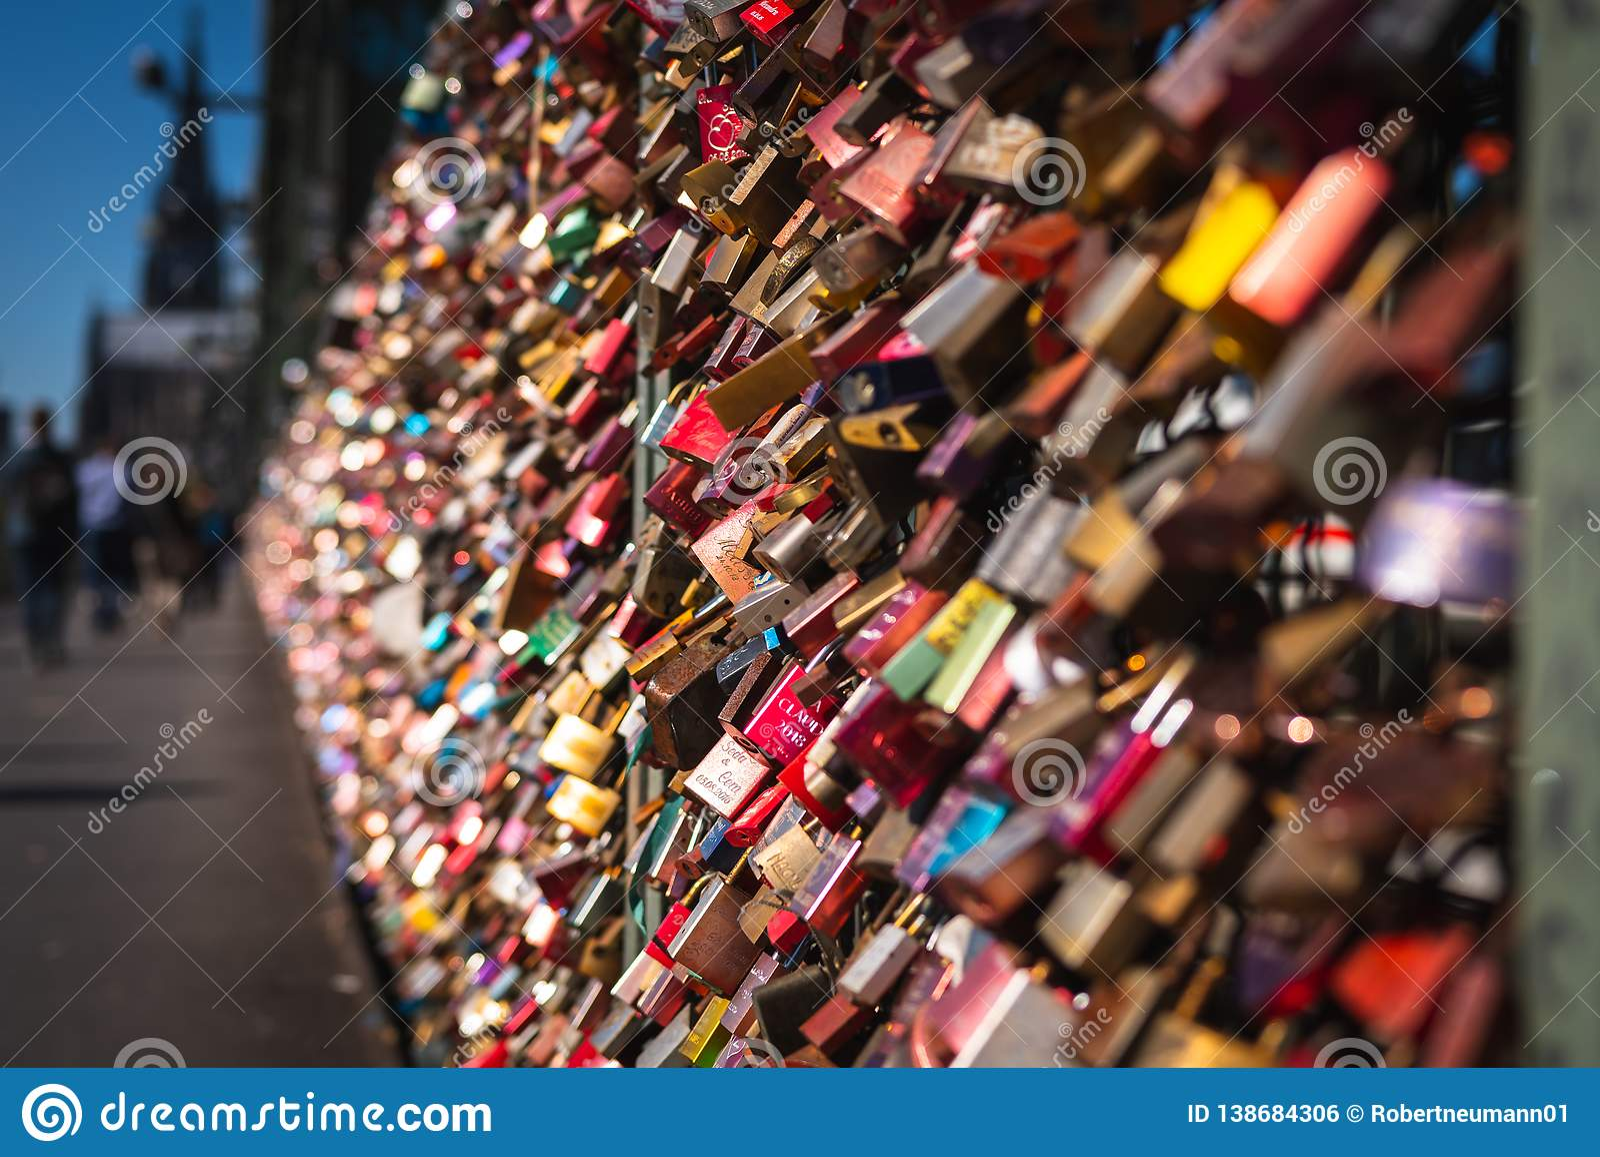 Love lock on a bridge